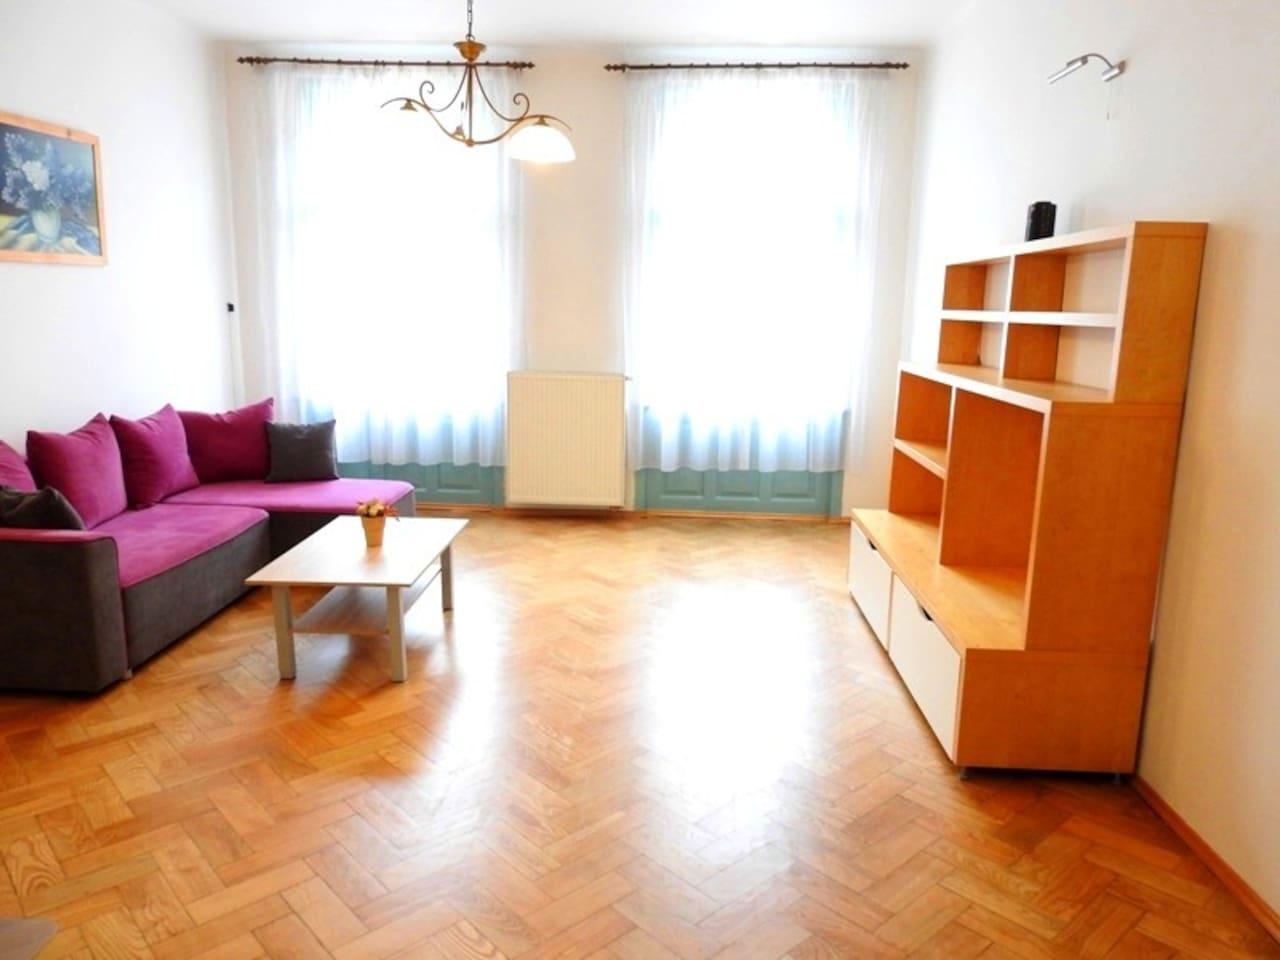 Living room or bedroom